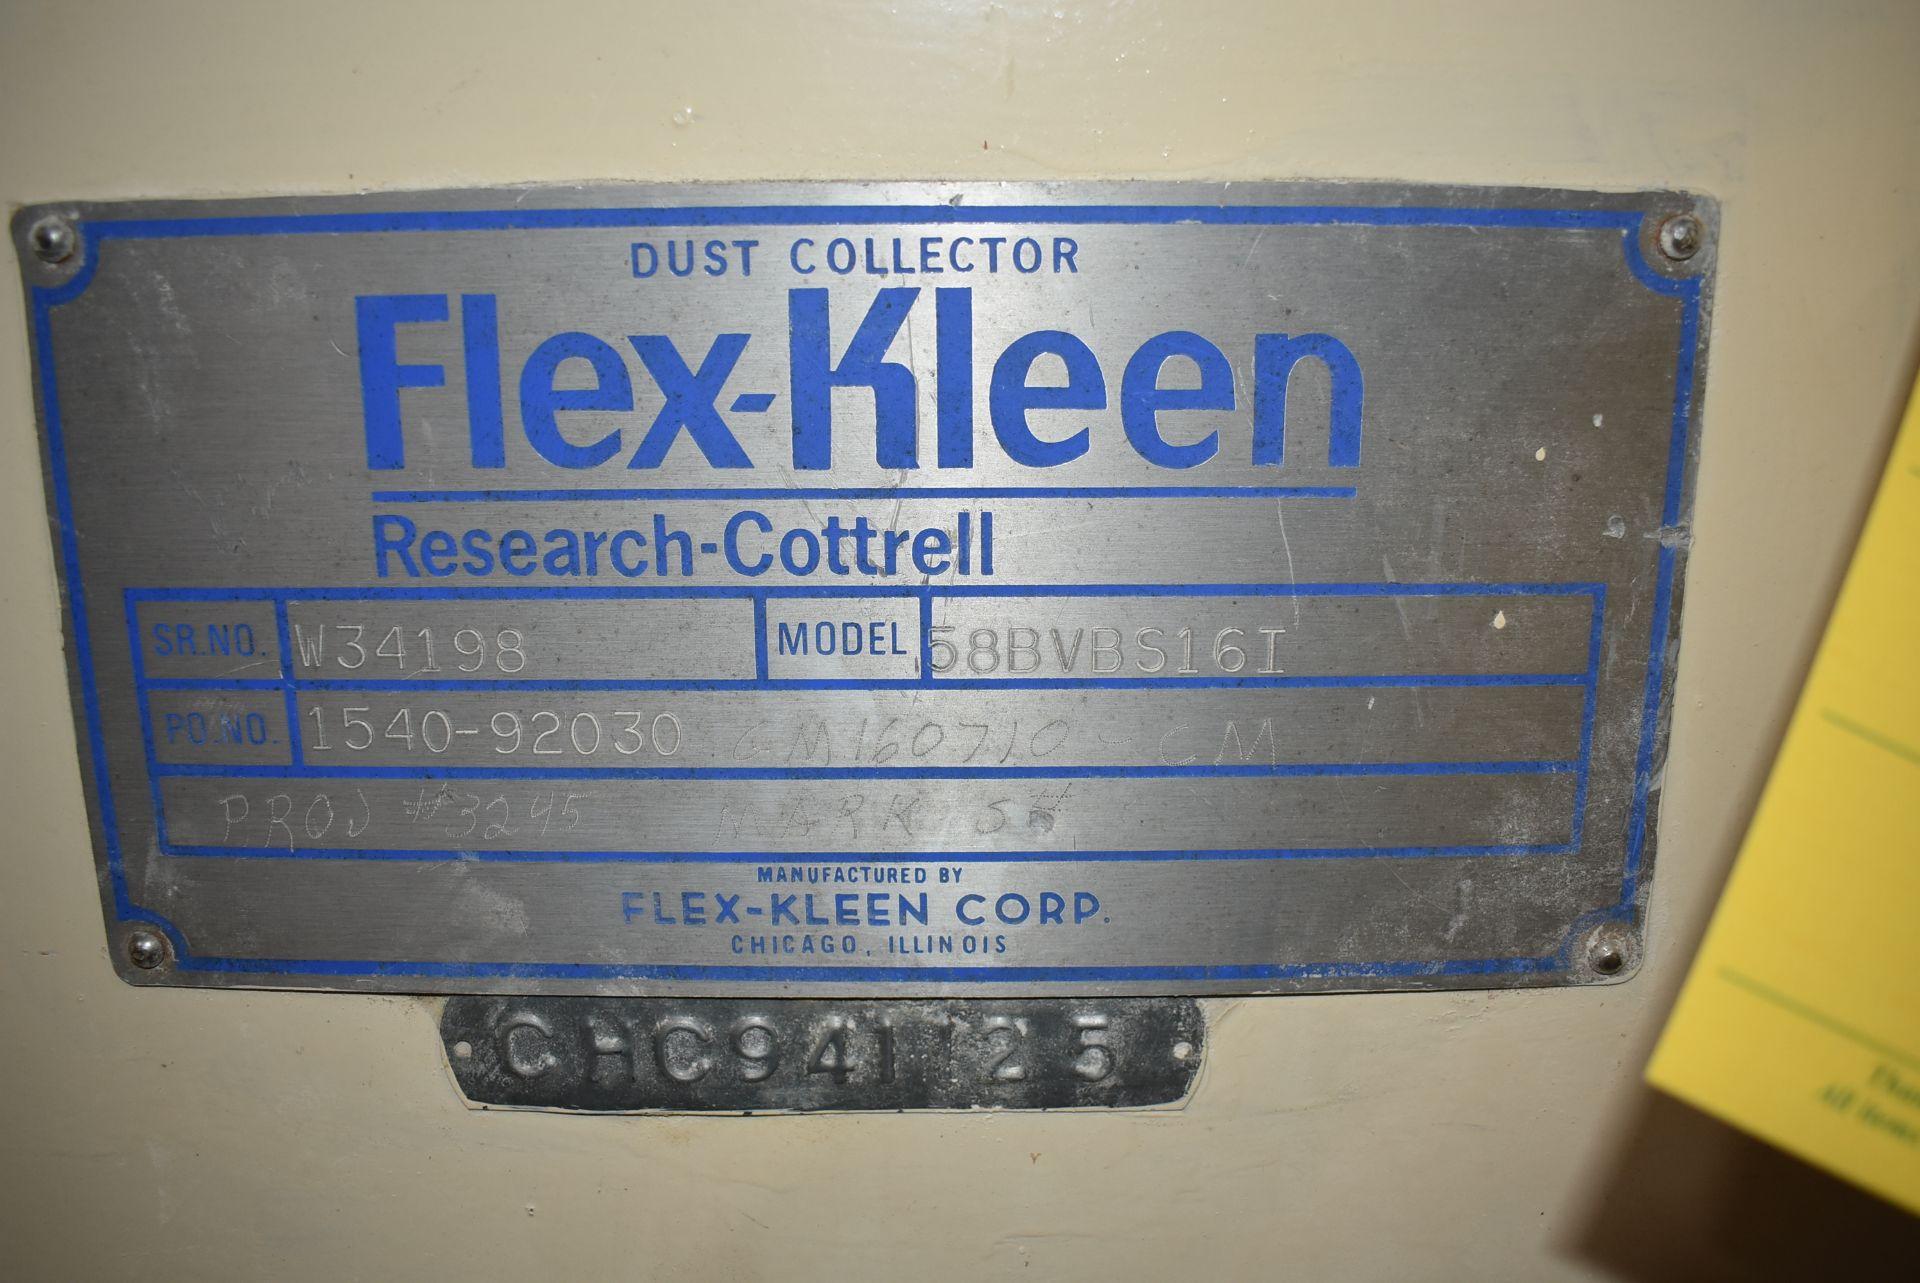 Flex-Kleen Model #58BVBS16 I Dust Collector - Image 2 of 3